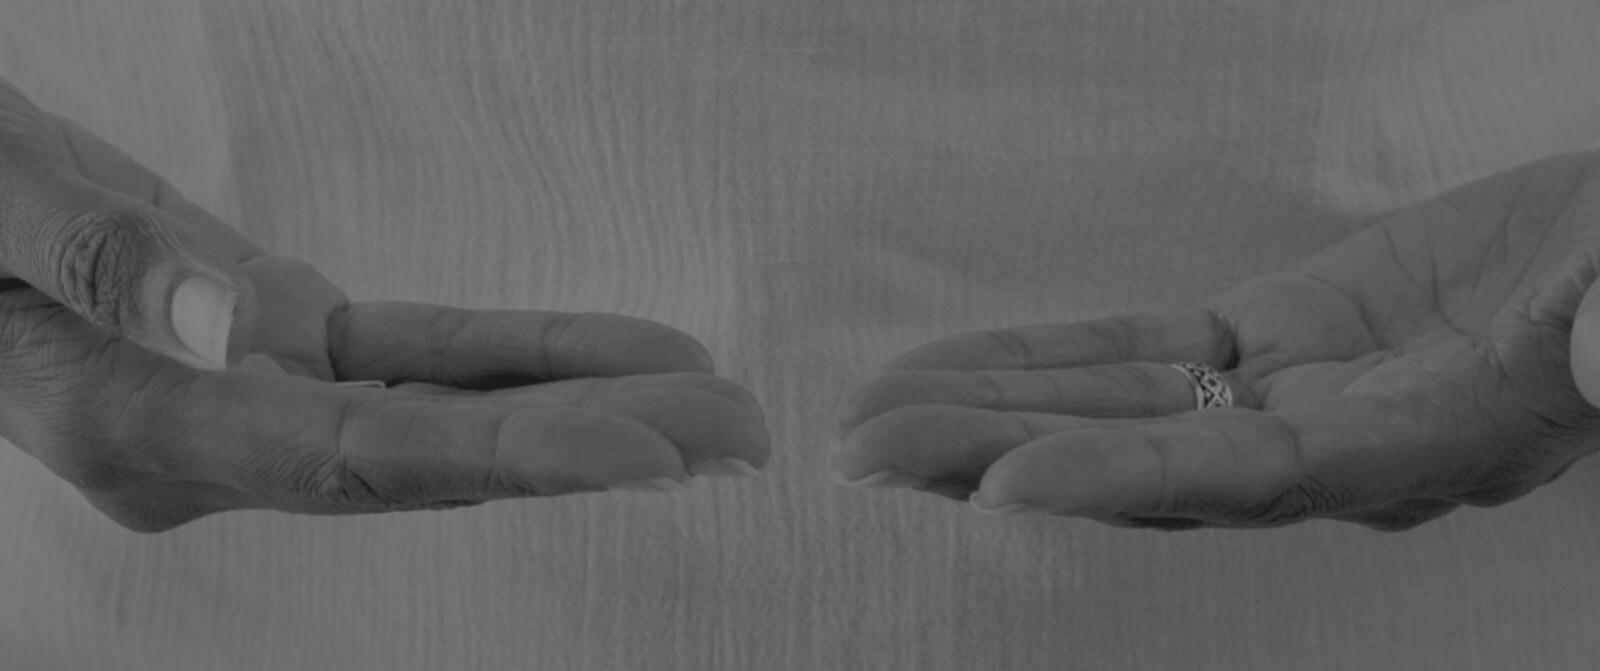 Méditation - mains- accueil - bienveillance